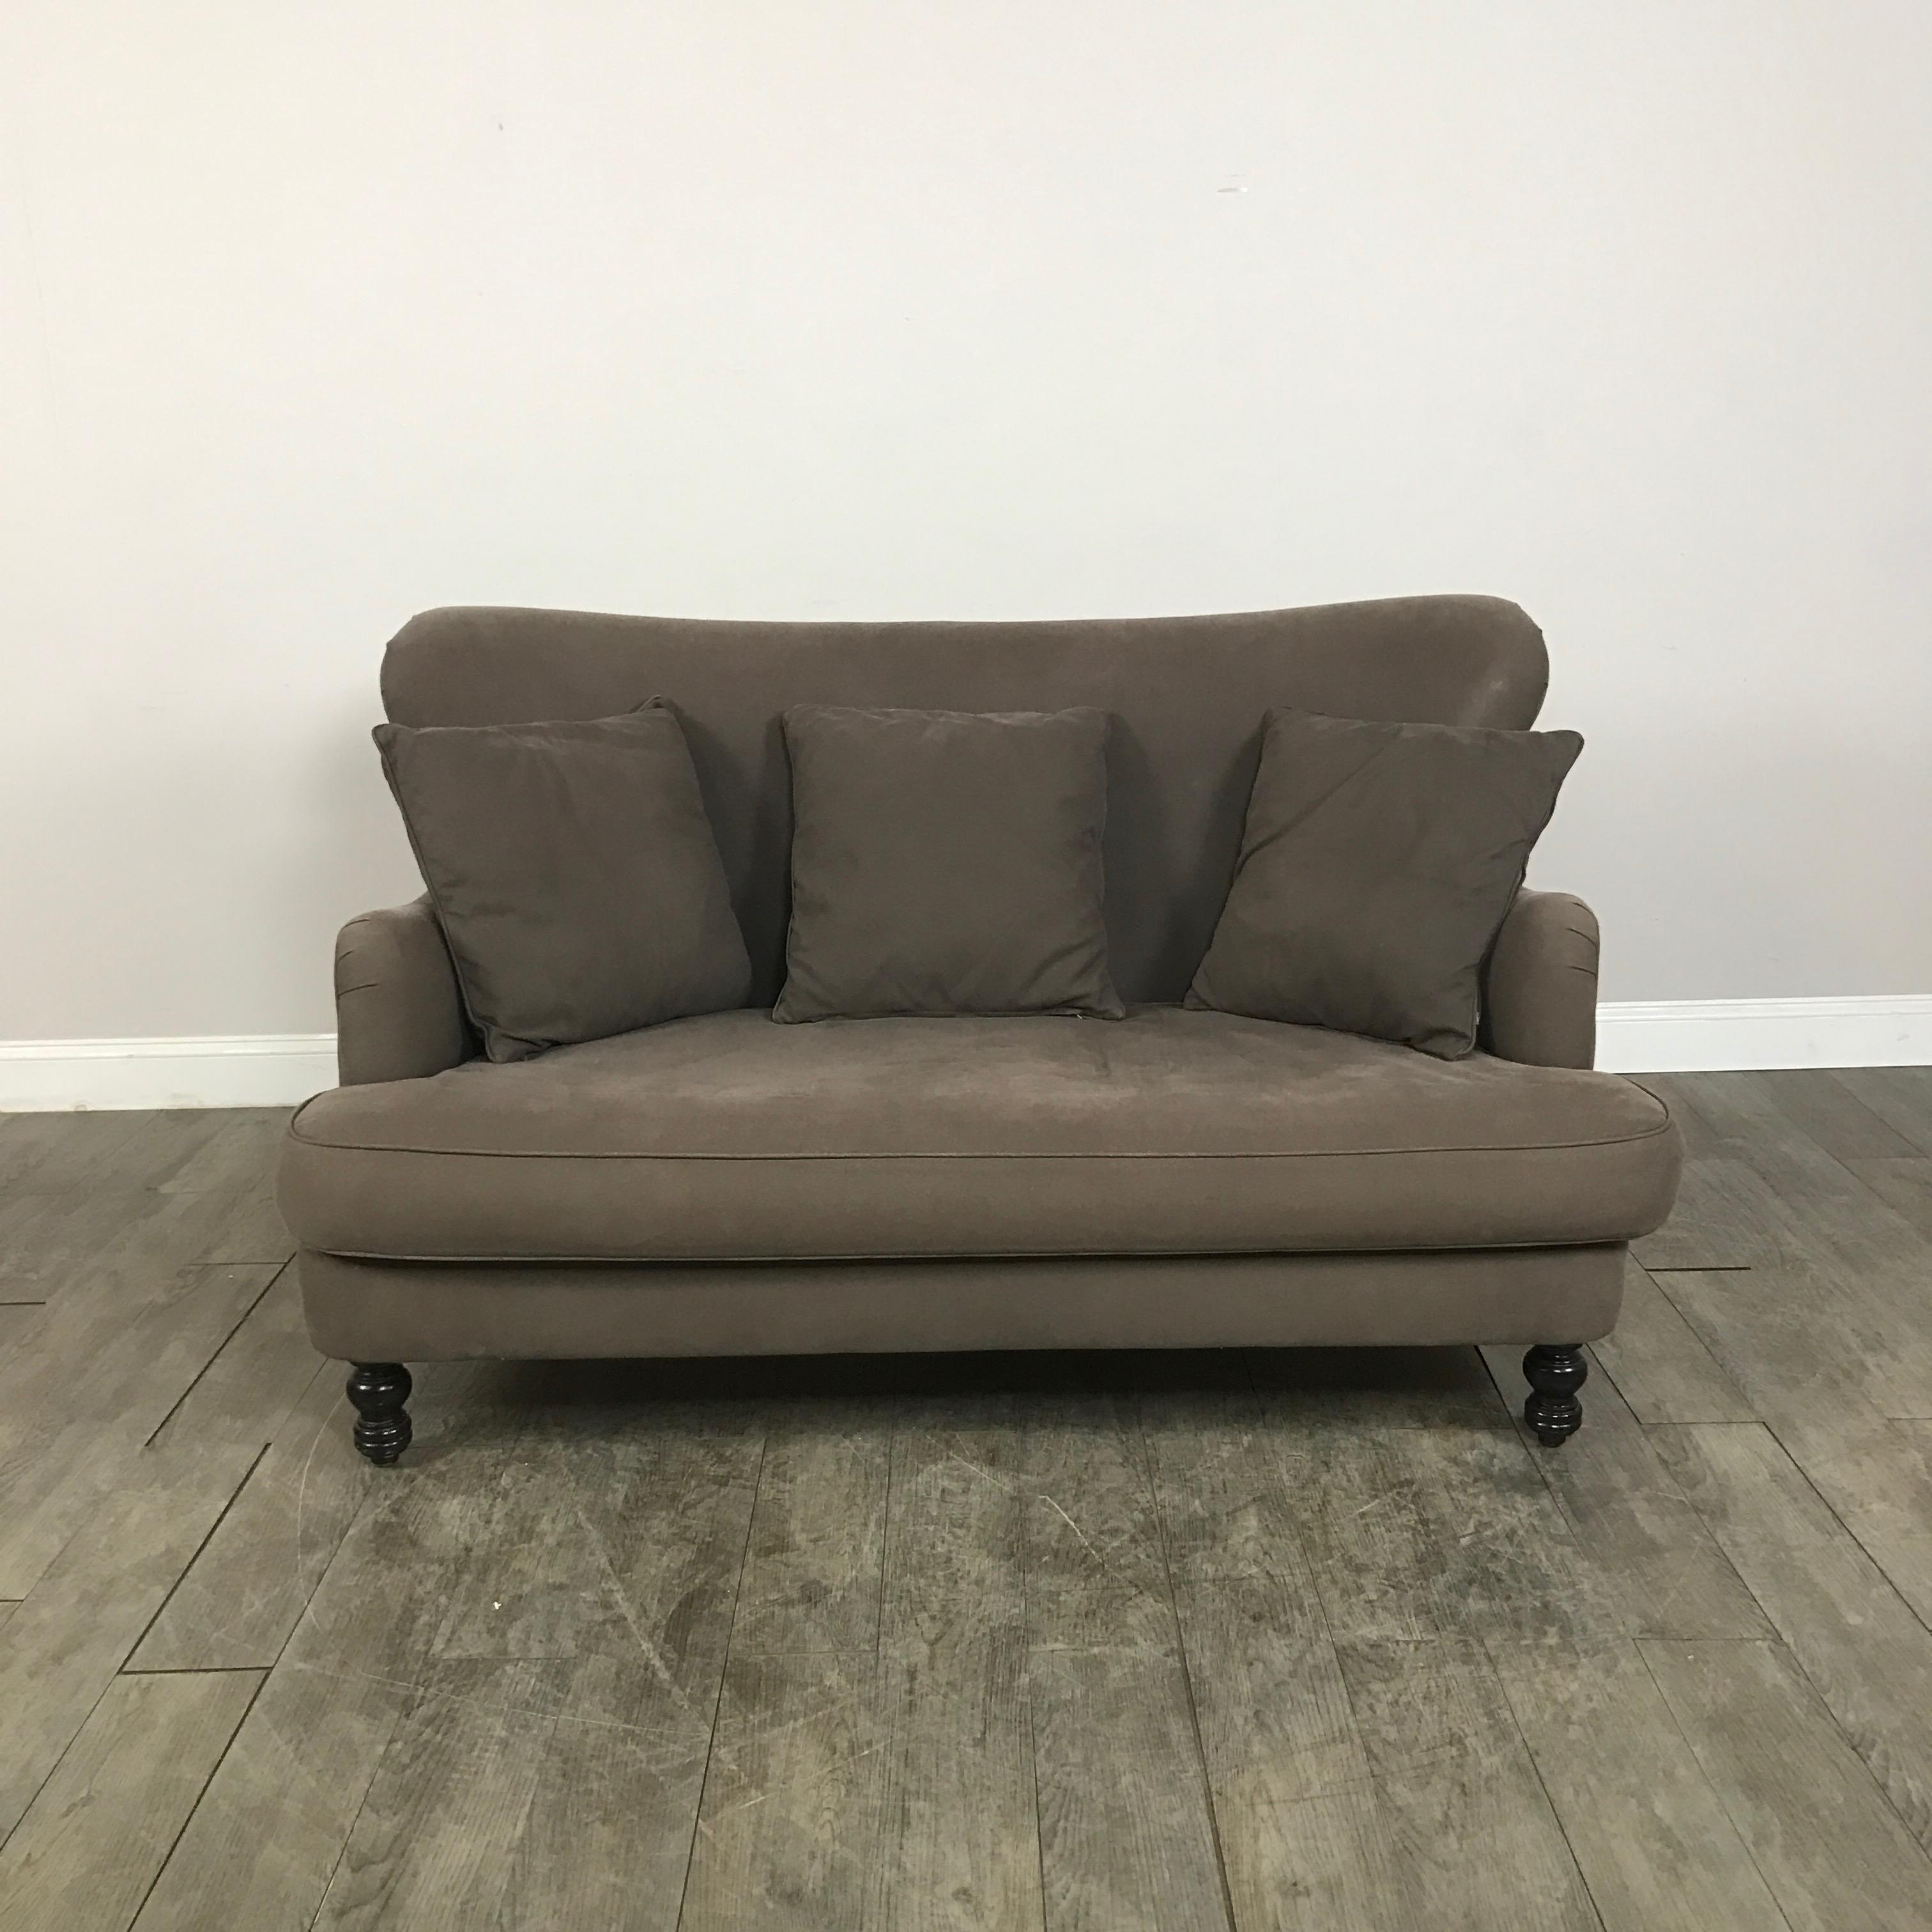 cisco brothers curved loveseat sofa chairish